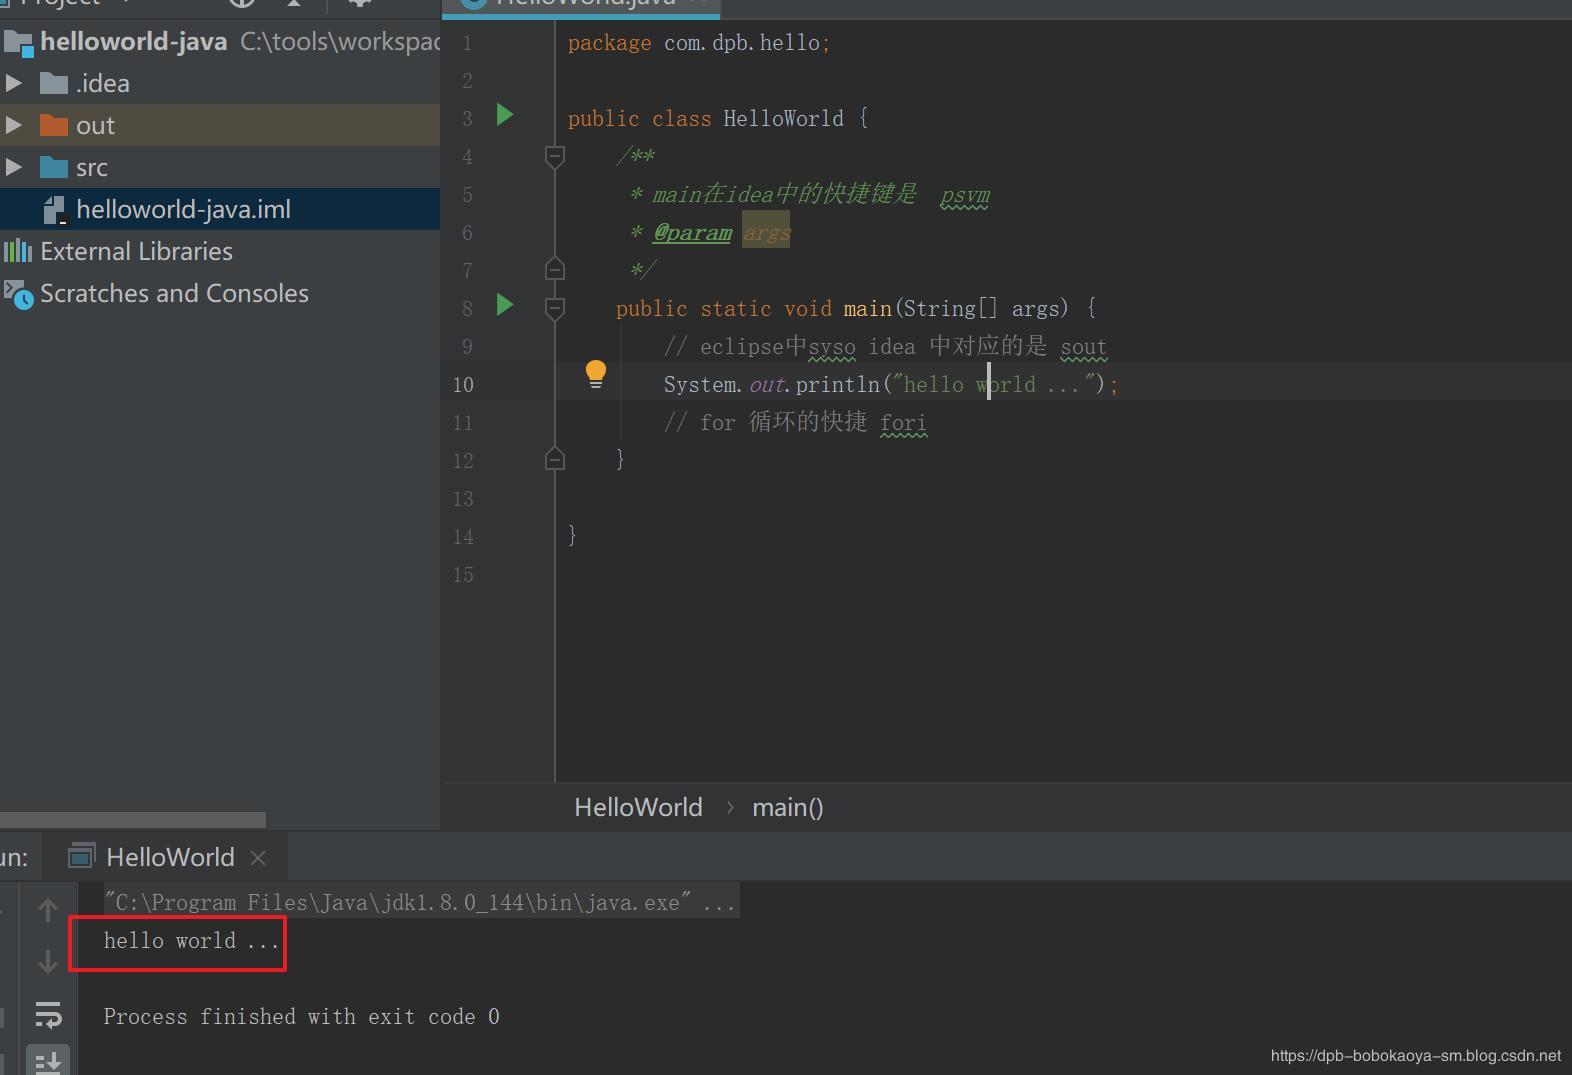 IntelliJ IDEA (2019) installation crack and HelloWorld case